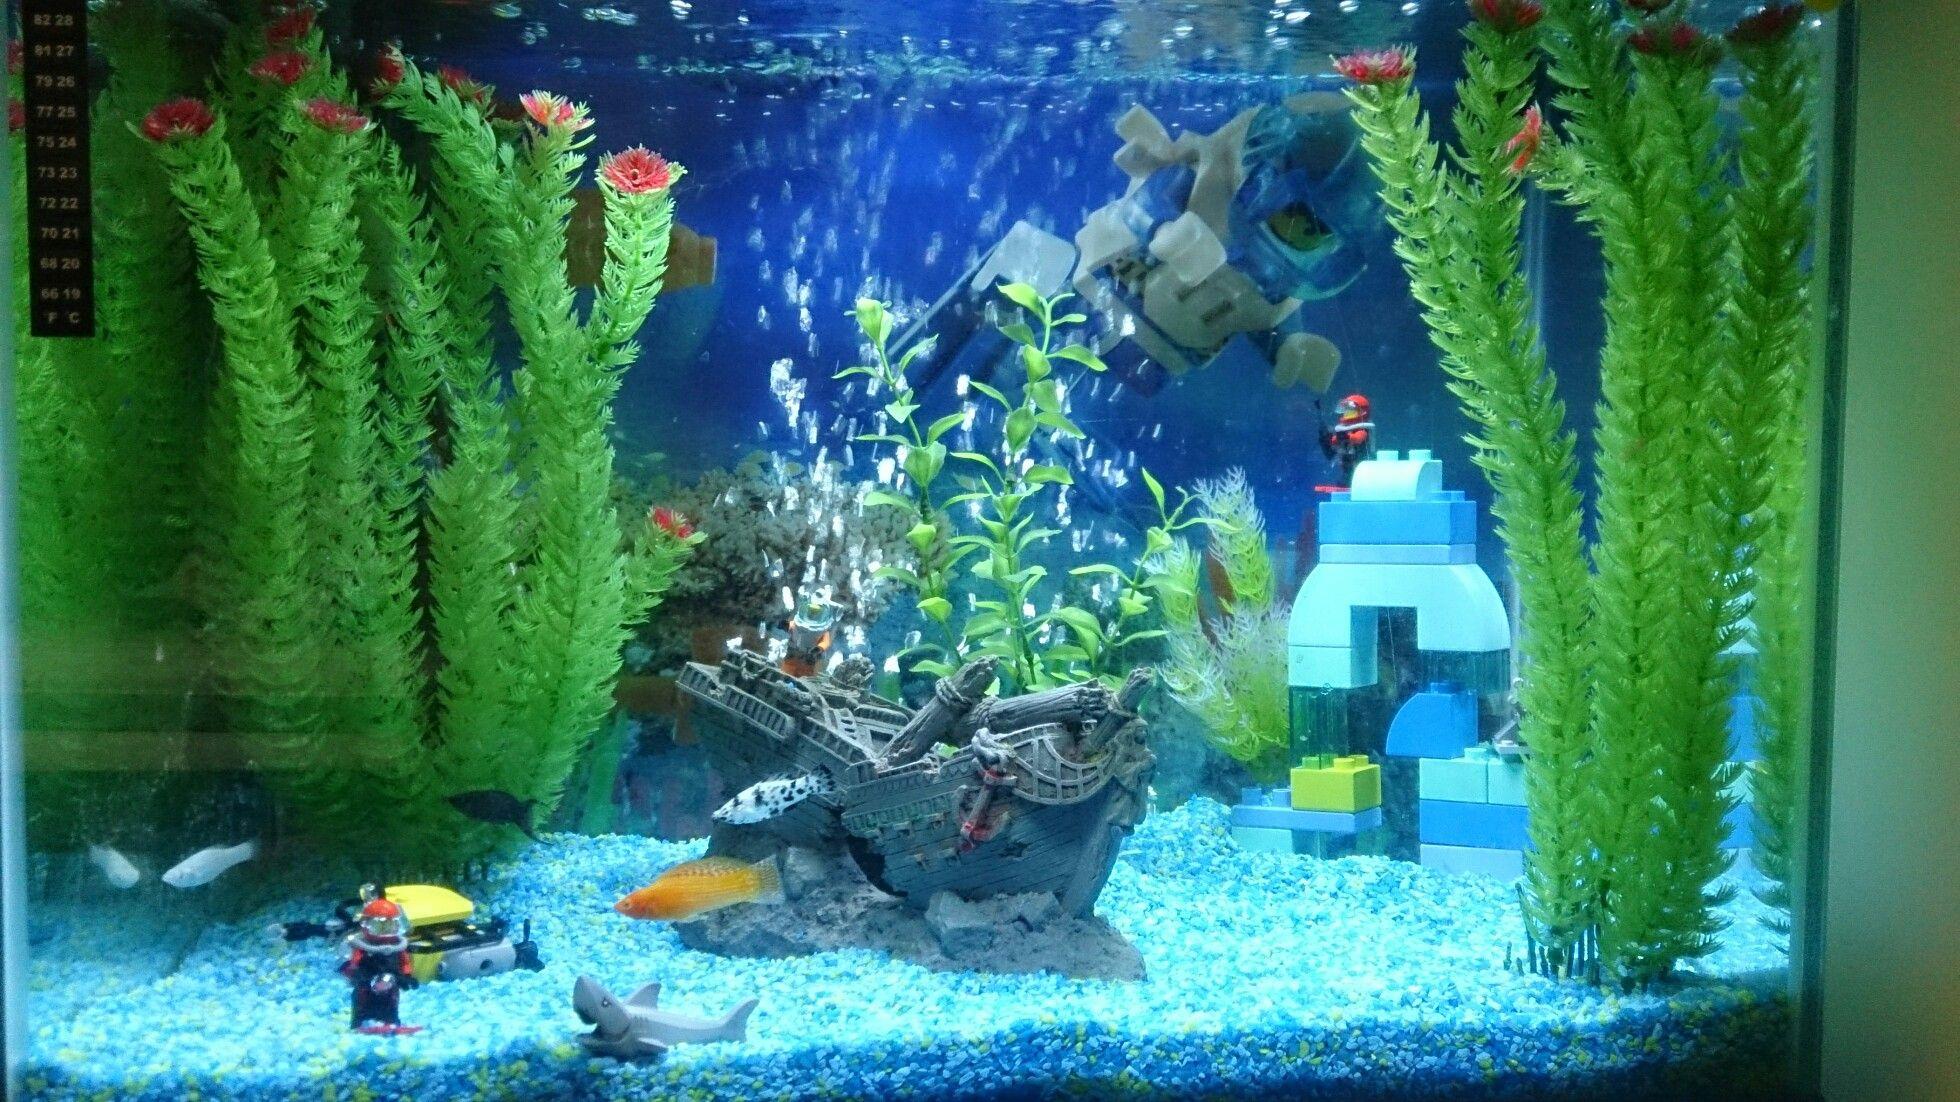 0e703bdd6eb5acfe1bb23b76cd9b7ff9 Incroyable De Aquarium Deco Des Idées